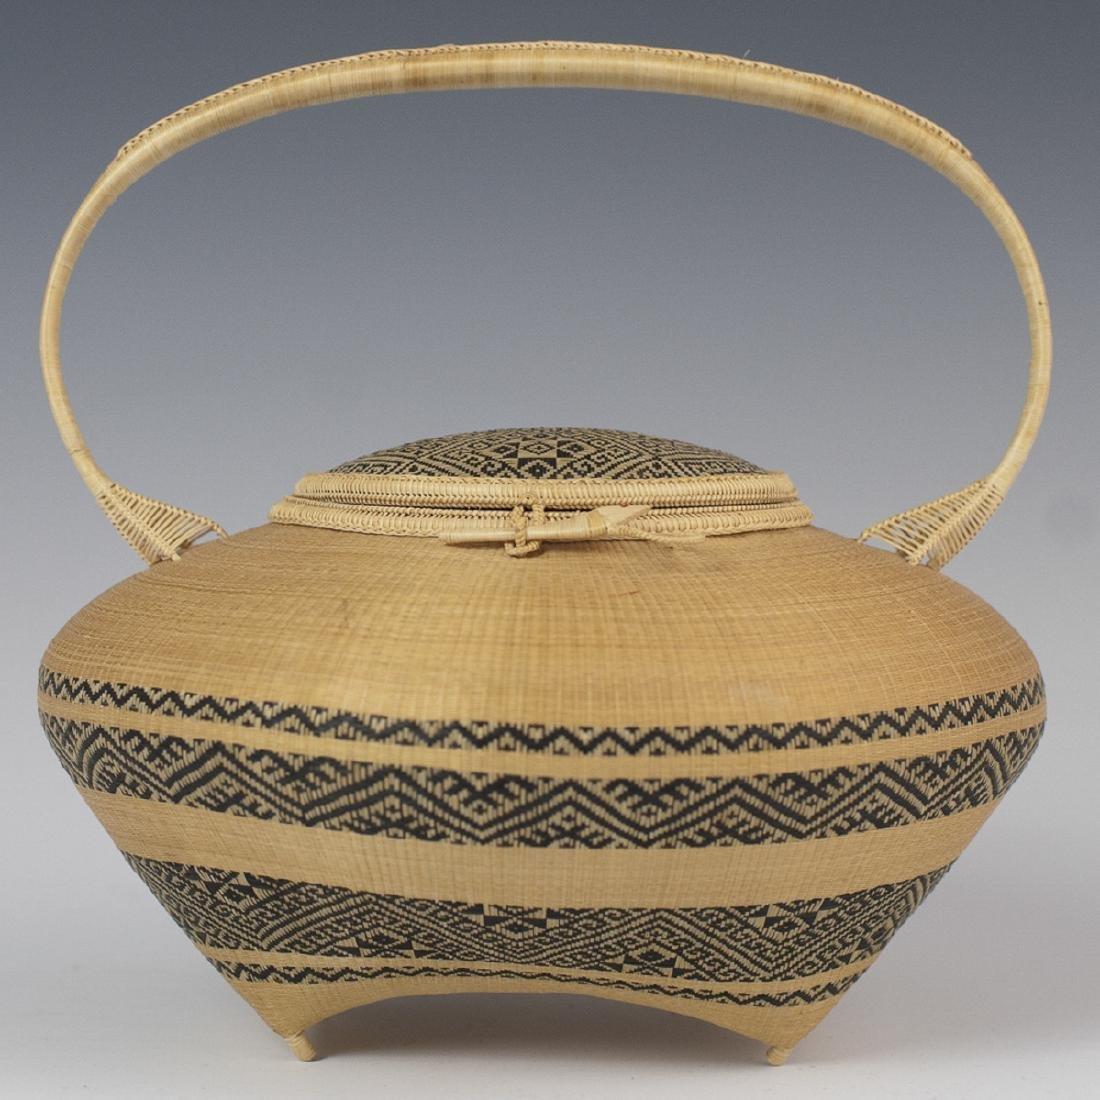 Antique Japanese Woven Lidded Bamboo Basket